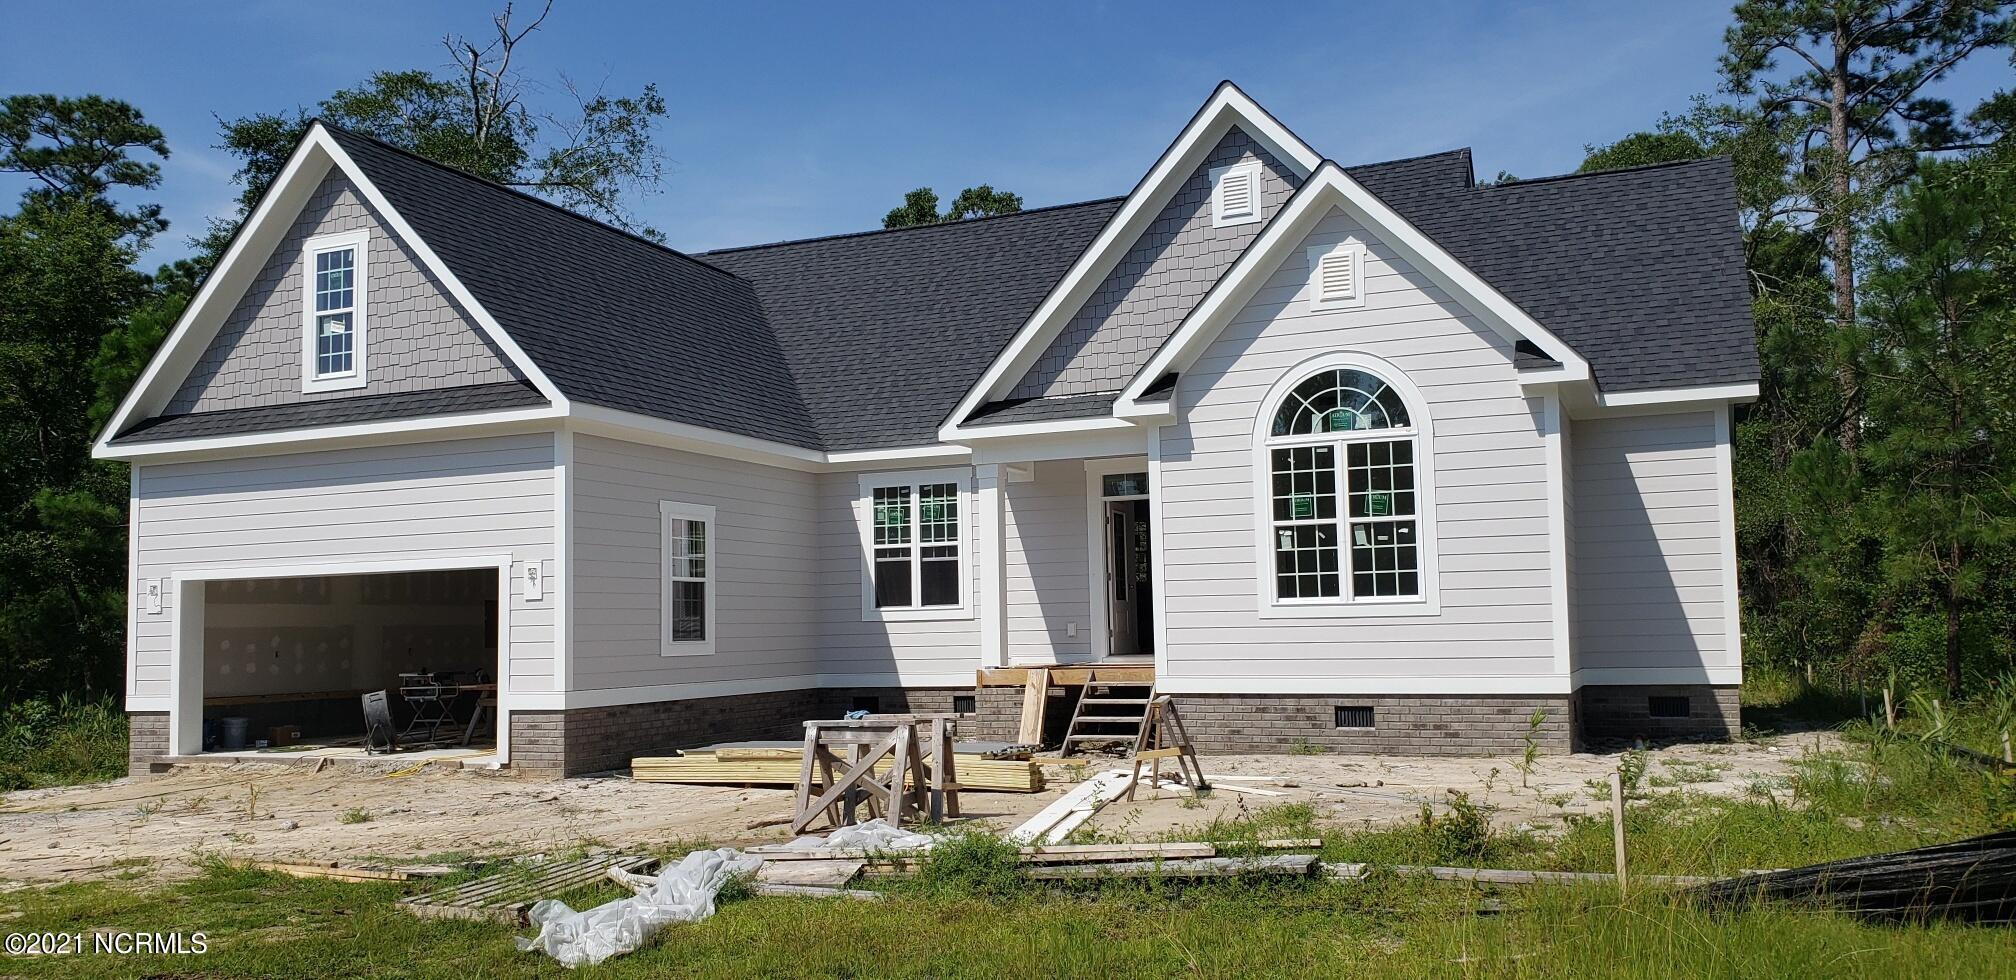 2849 White Dove Circle, Supply, North Carolina 28462, 3 Bedrooms Bedrooms, 6 Rooms Rooms,2 BathroomsBathrooms,Single family residence,For sale,White Dove,100285348